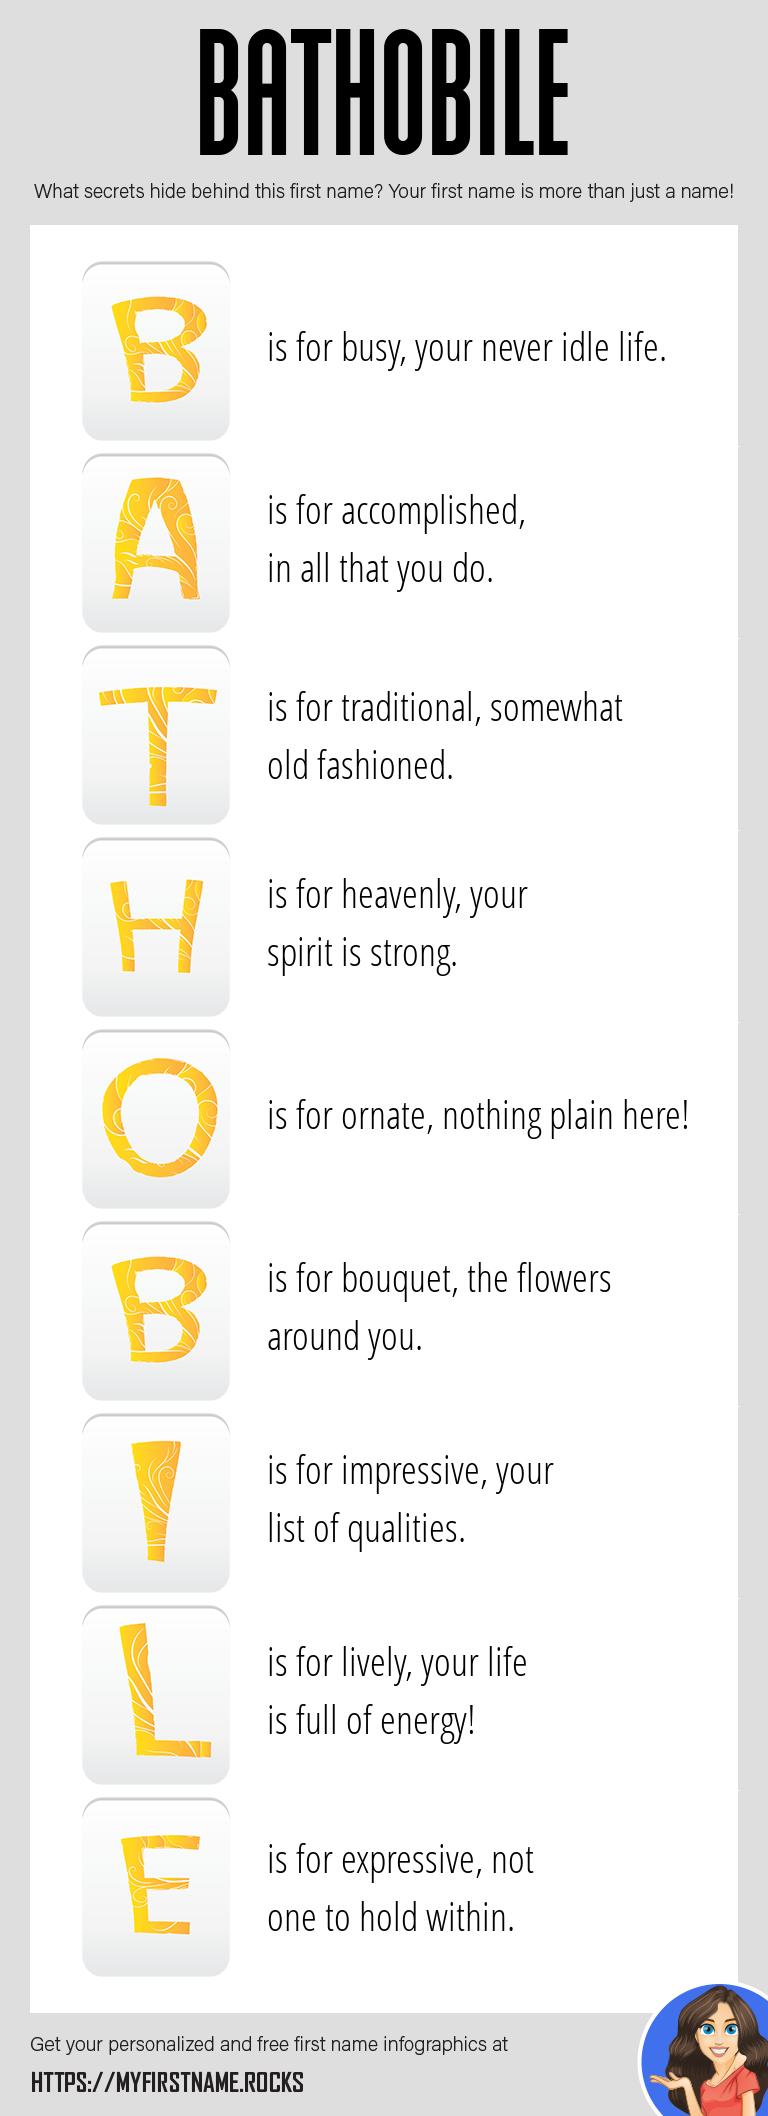 Bathobile Infographics